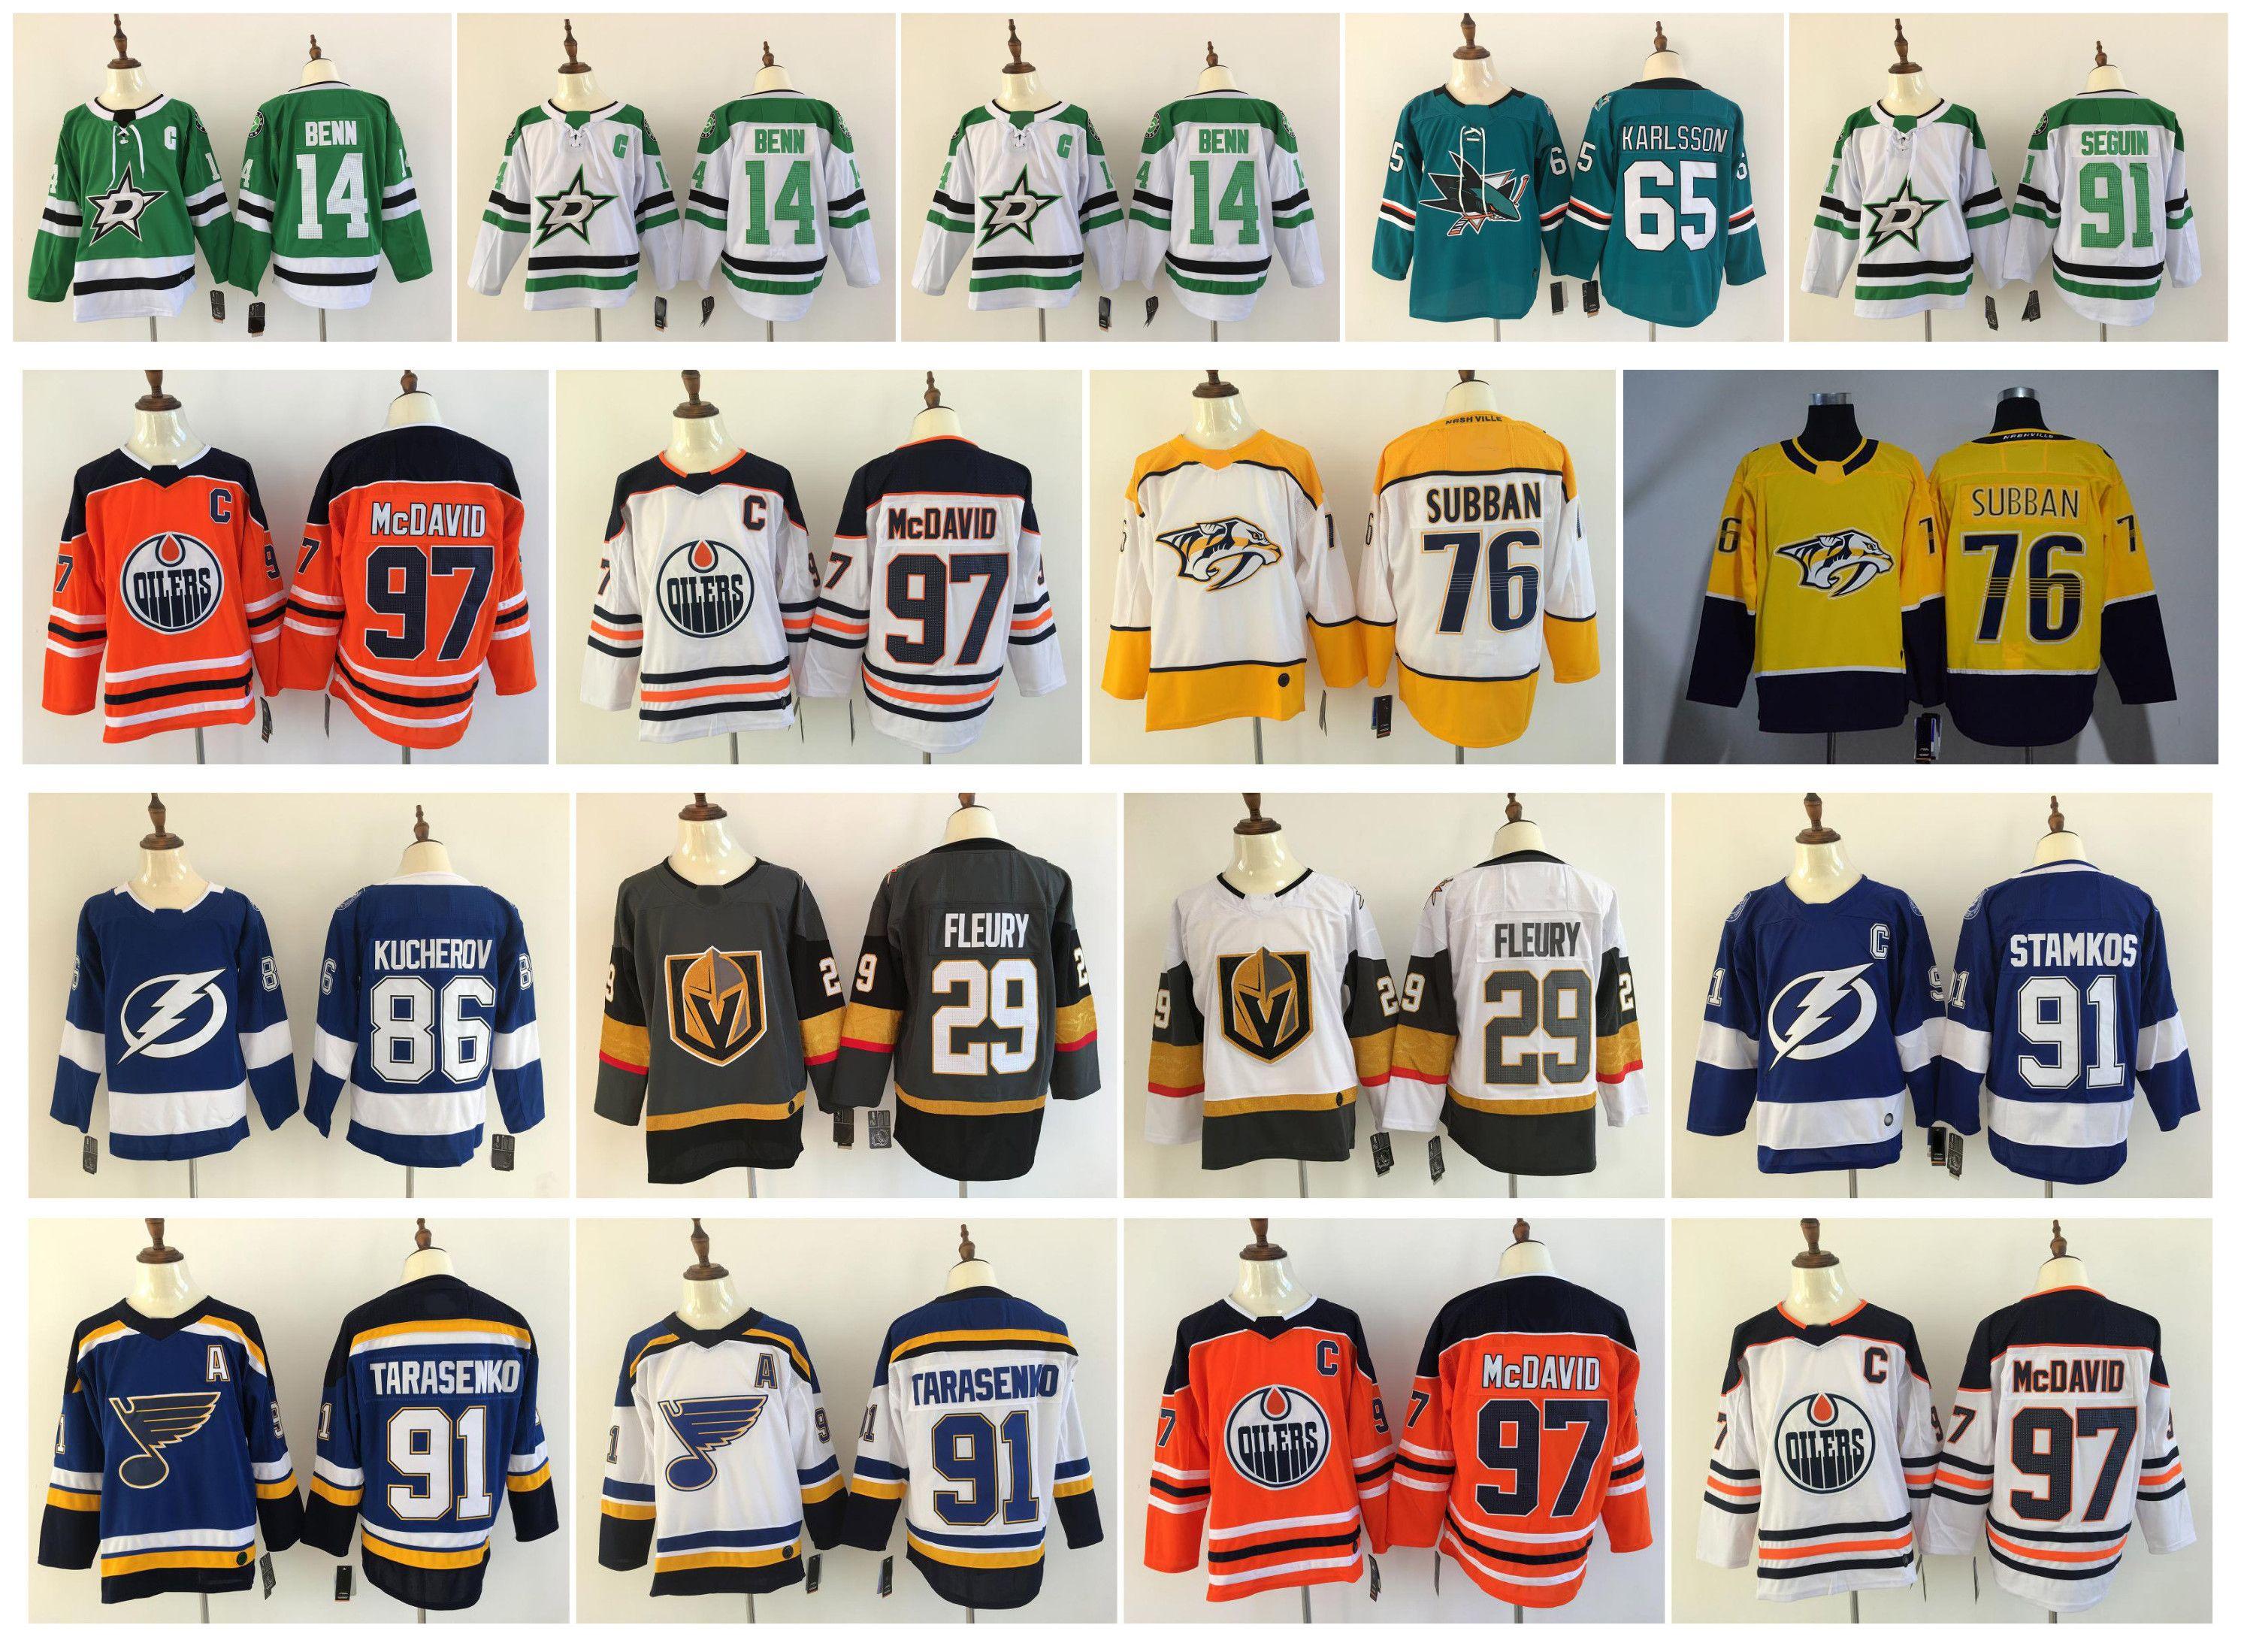 newest 1b5f6 58b2d NHL Hockey Jersey 97 Connor McDavid 29 Marc-Andre Fleury Tyler Seguin  Vladimir Tarasenko 91 Steven Stamkos 86 Nikita Kucherov 88 Brent Burns